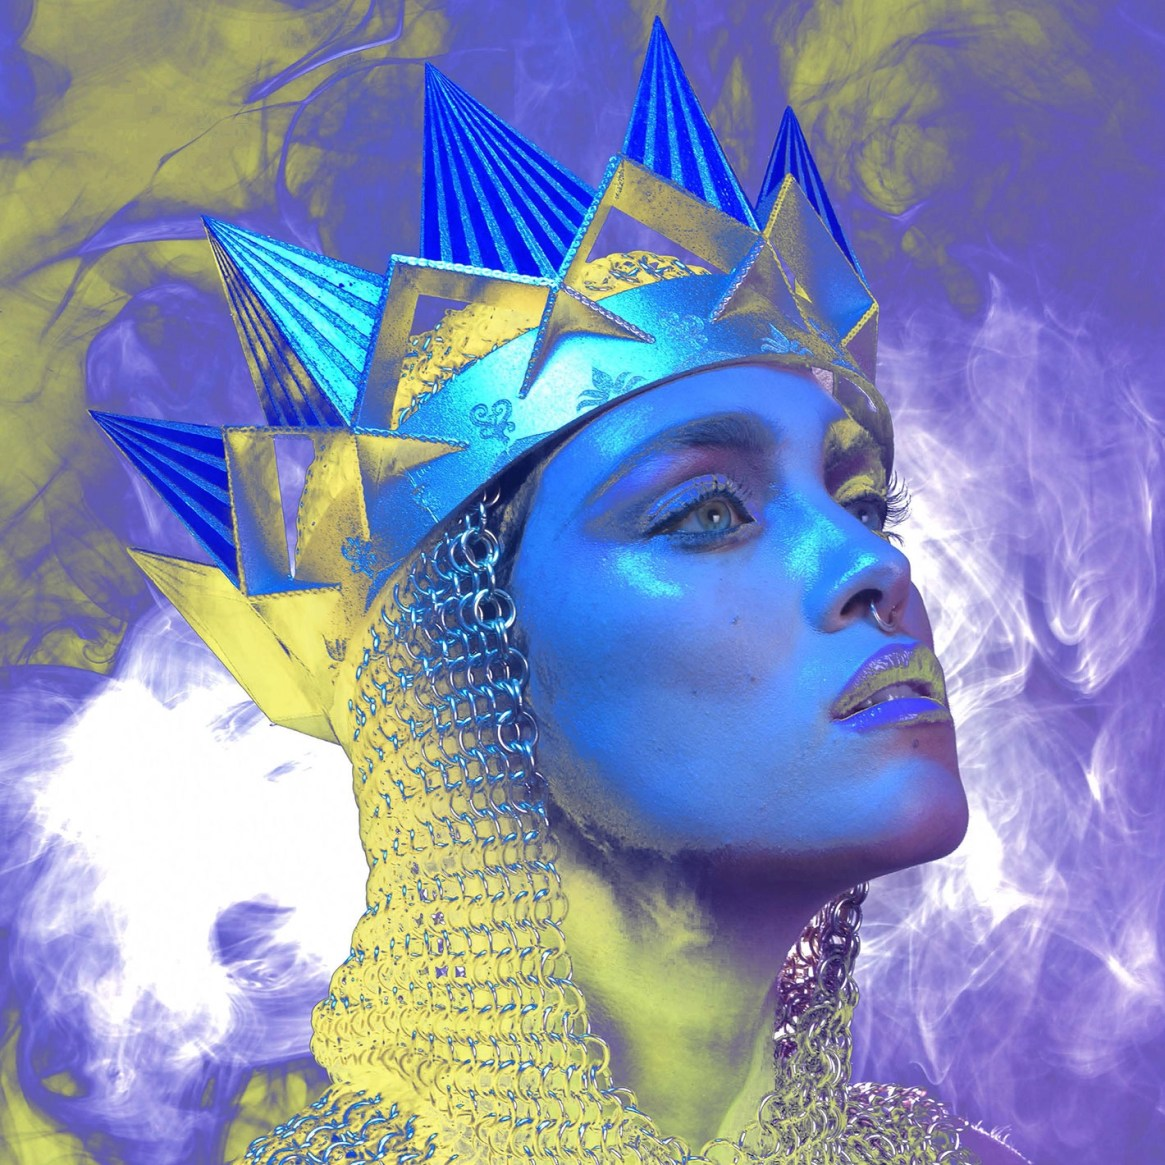 Victor Mucio Royal Crowns FLESH Magazine Ivan Aguirre